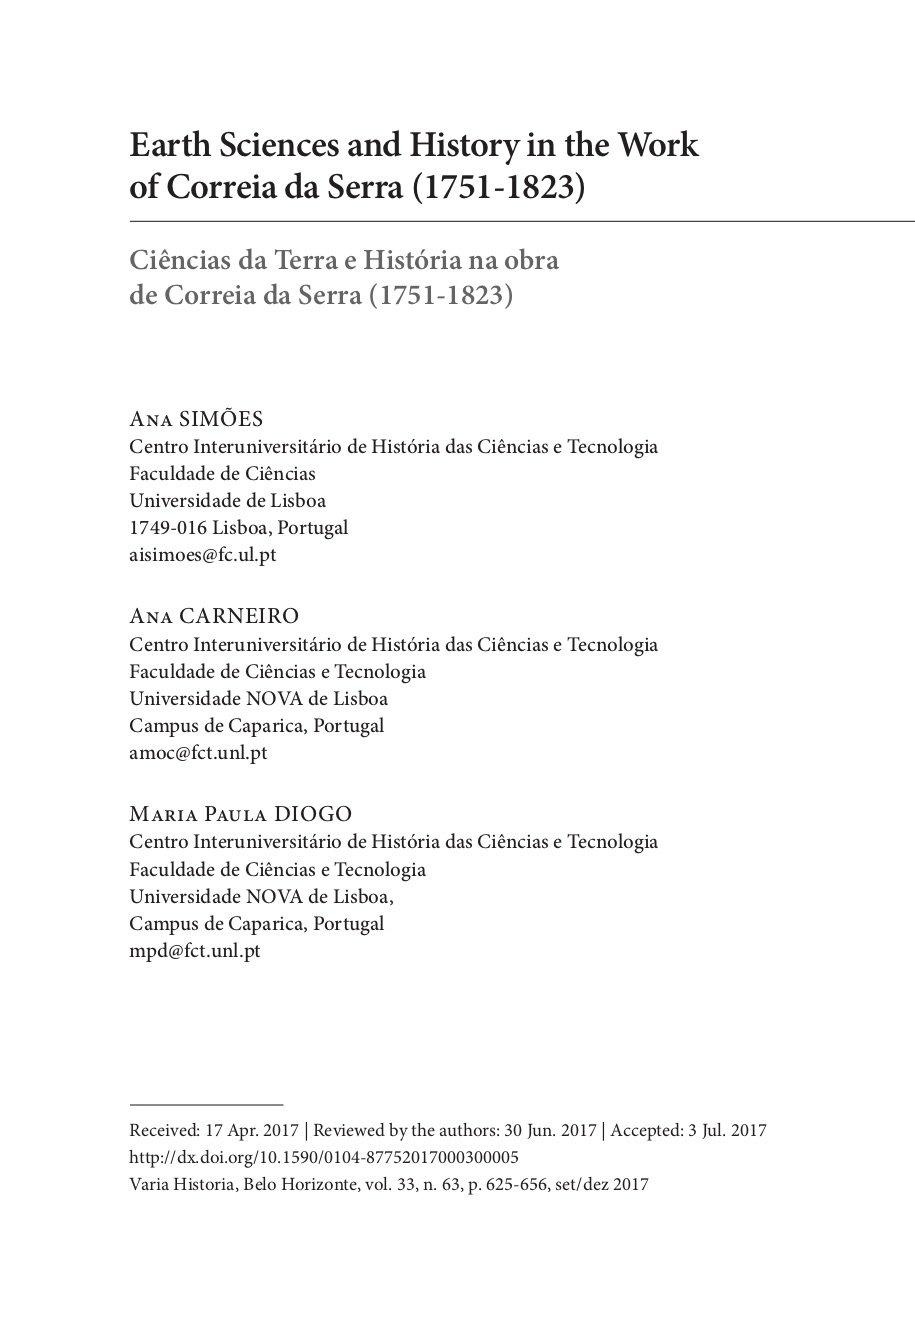 Earth Sciences and History in the Work of Correia da Serra (1751-1823), Capa